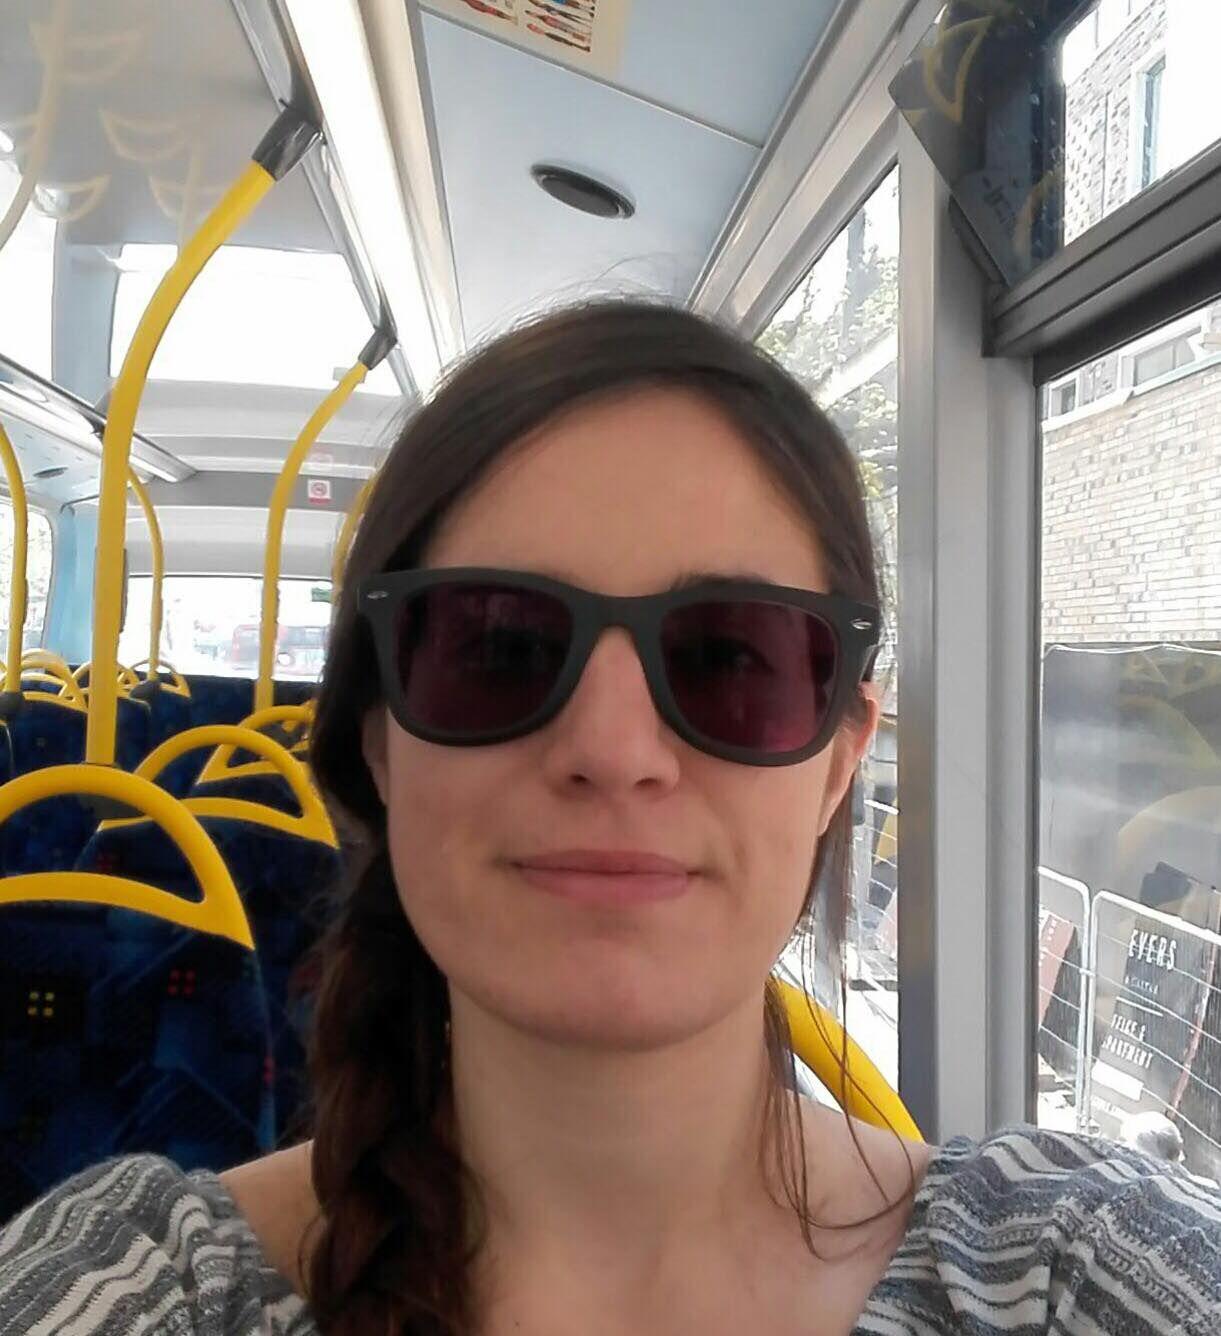 Image may contain: Glasses, Human, Person, Accessory, Accessories, Sunglasses